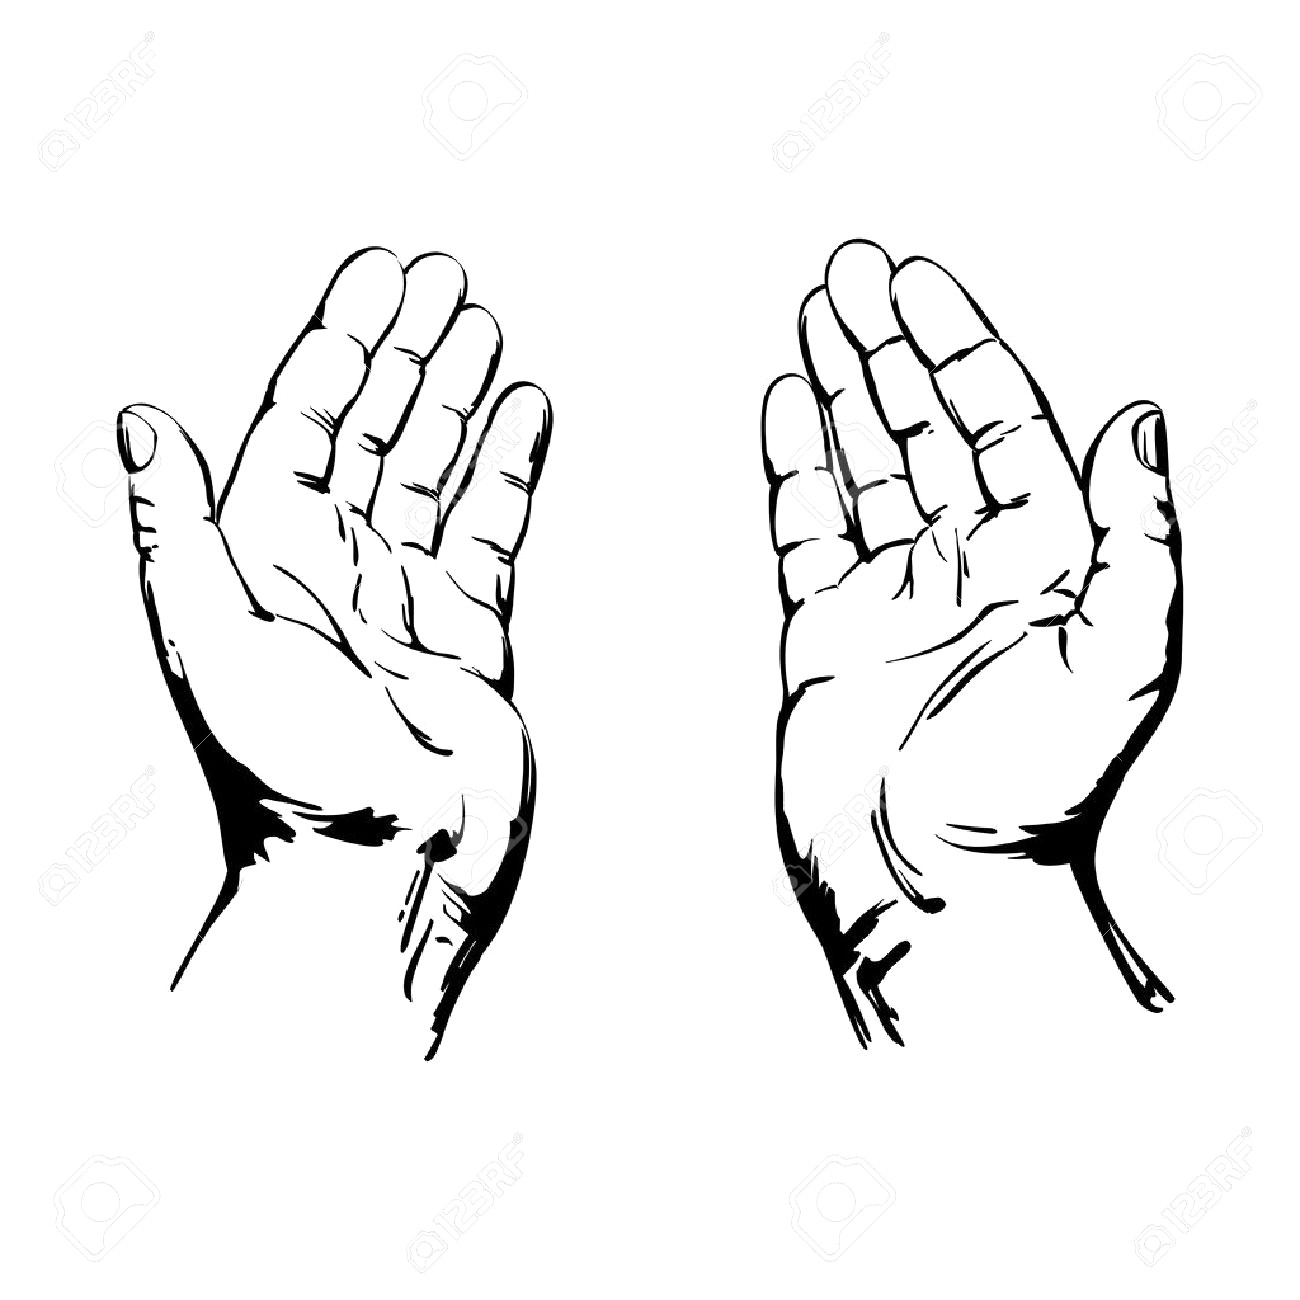 1300x1300 Praying Hands Tattoo Drawing